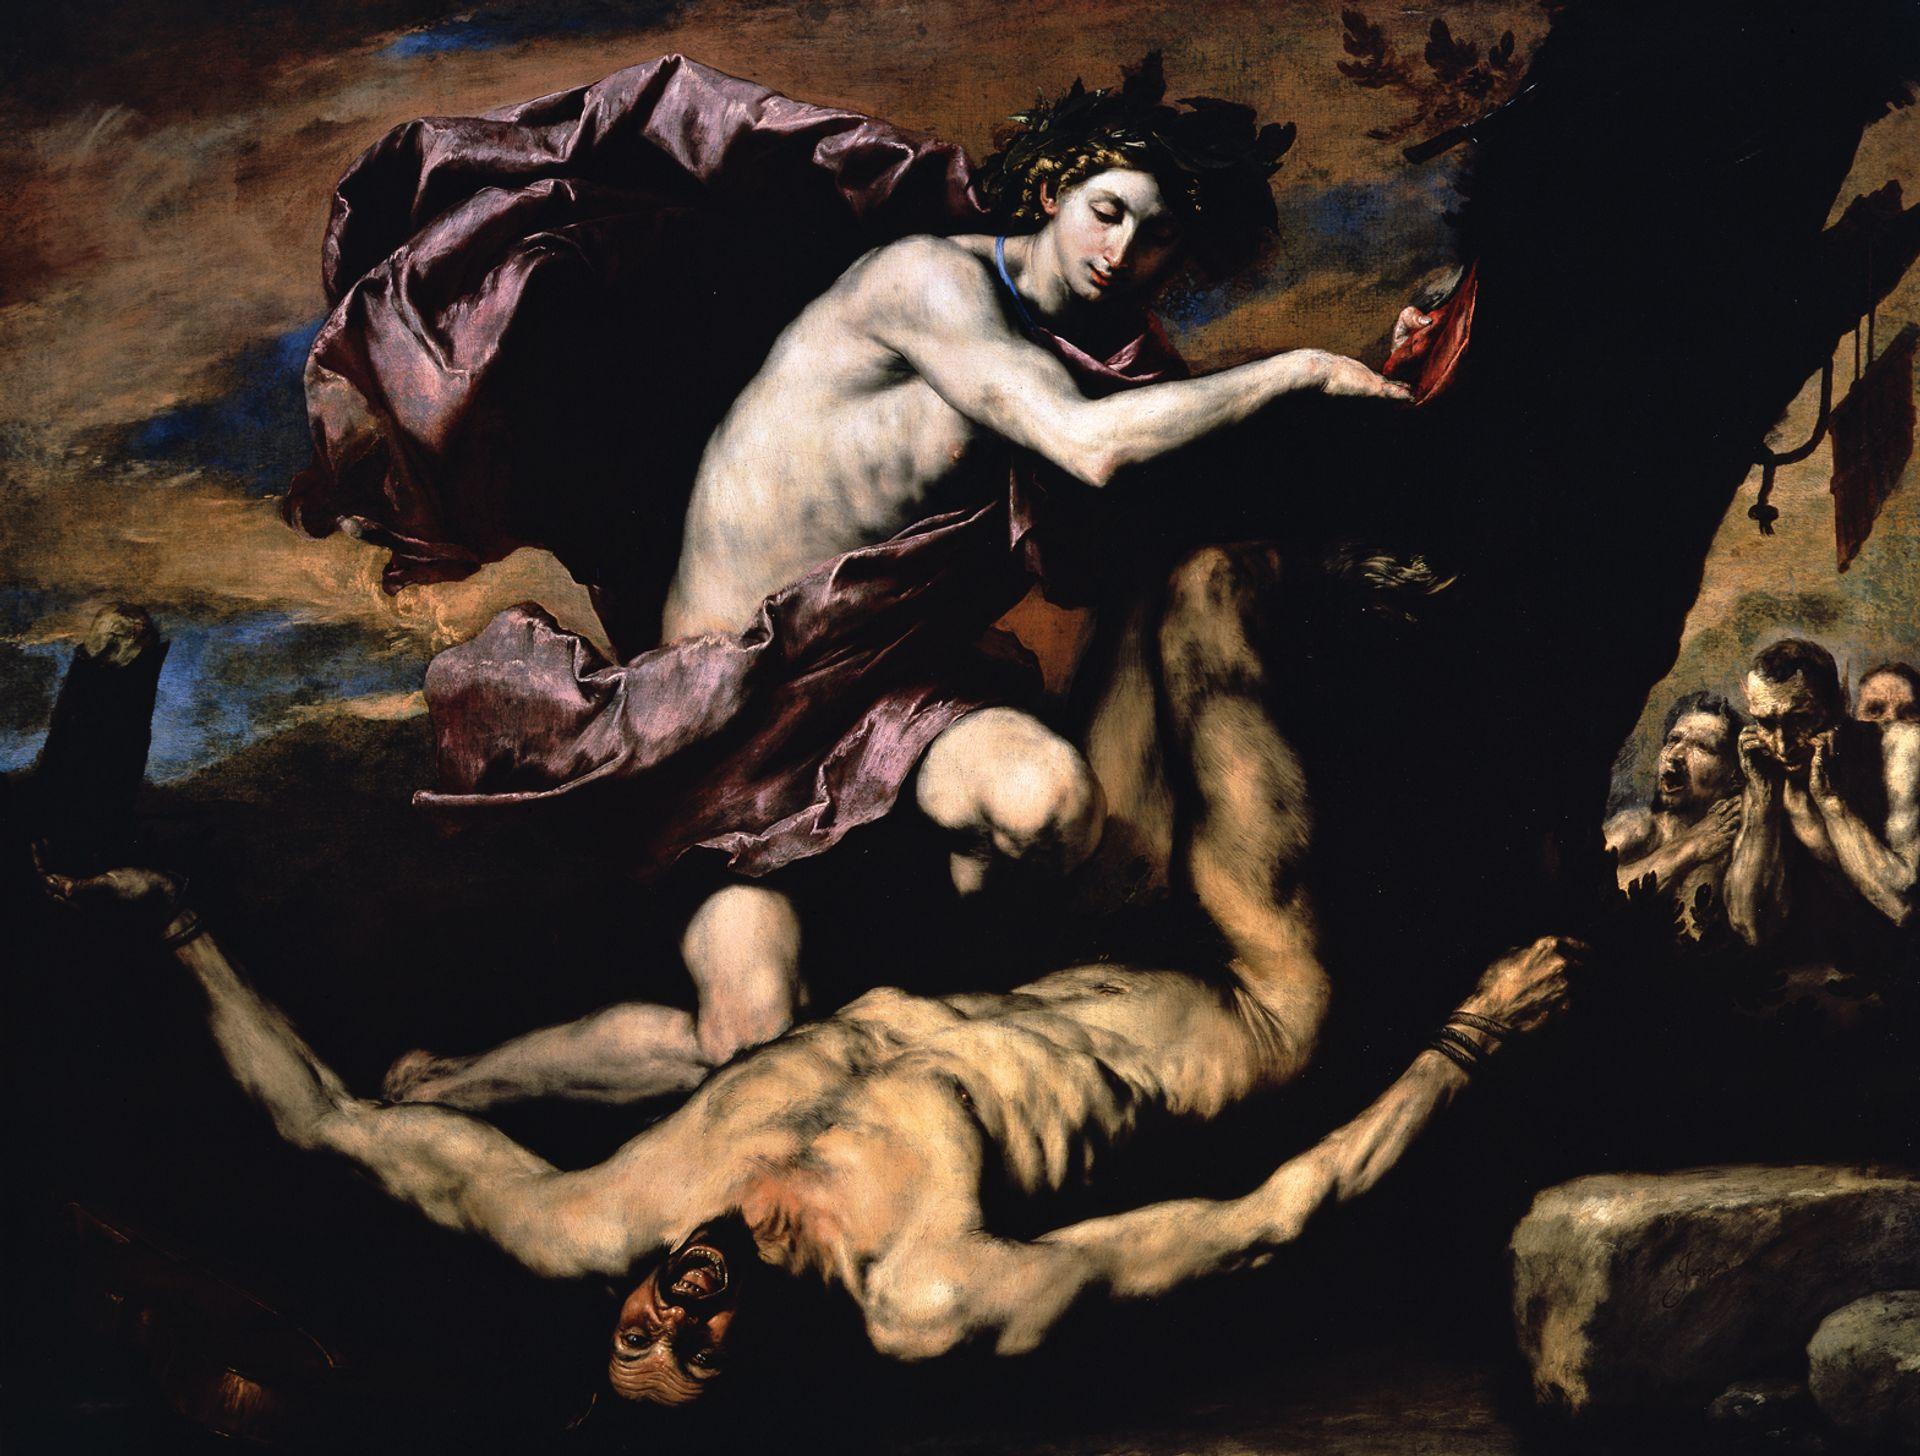 Jusepe de Ribera's Apollo and Marsyas (1637) is on loan from Naples © Museo e Real Bosco di Capodimonte